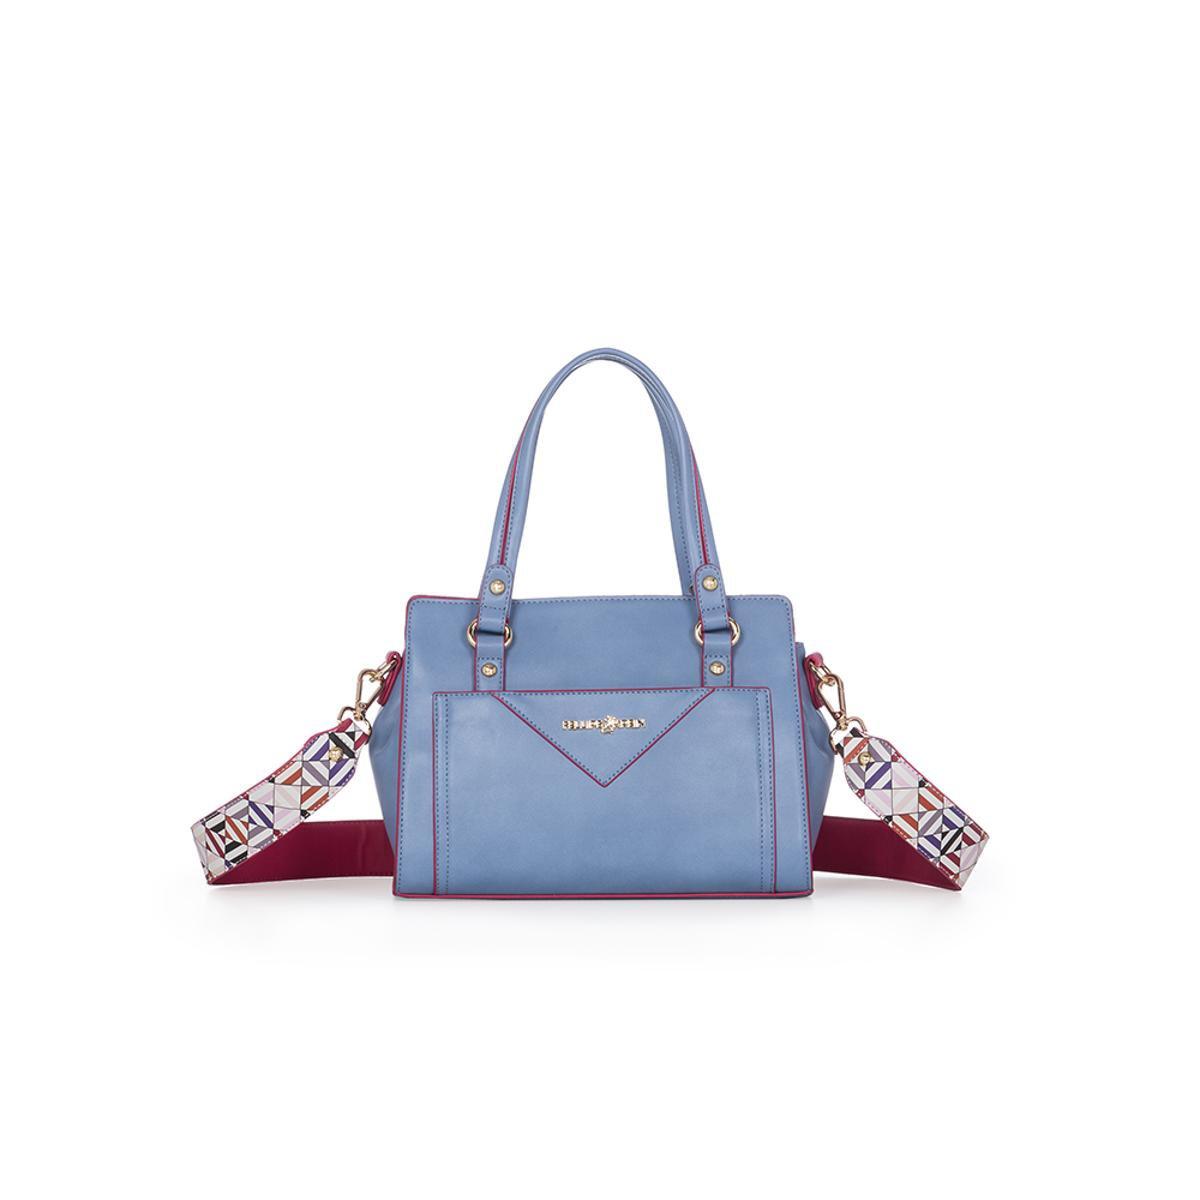 4d5d4445b Bolsa Fellipe Krein Feminina - Compre Agora | Netshoes